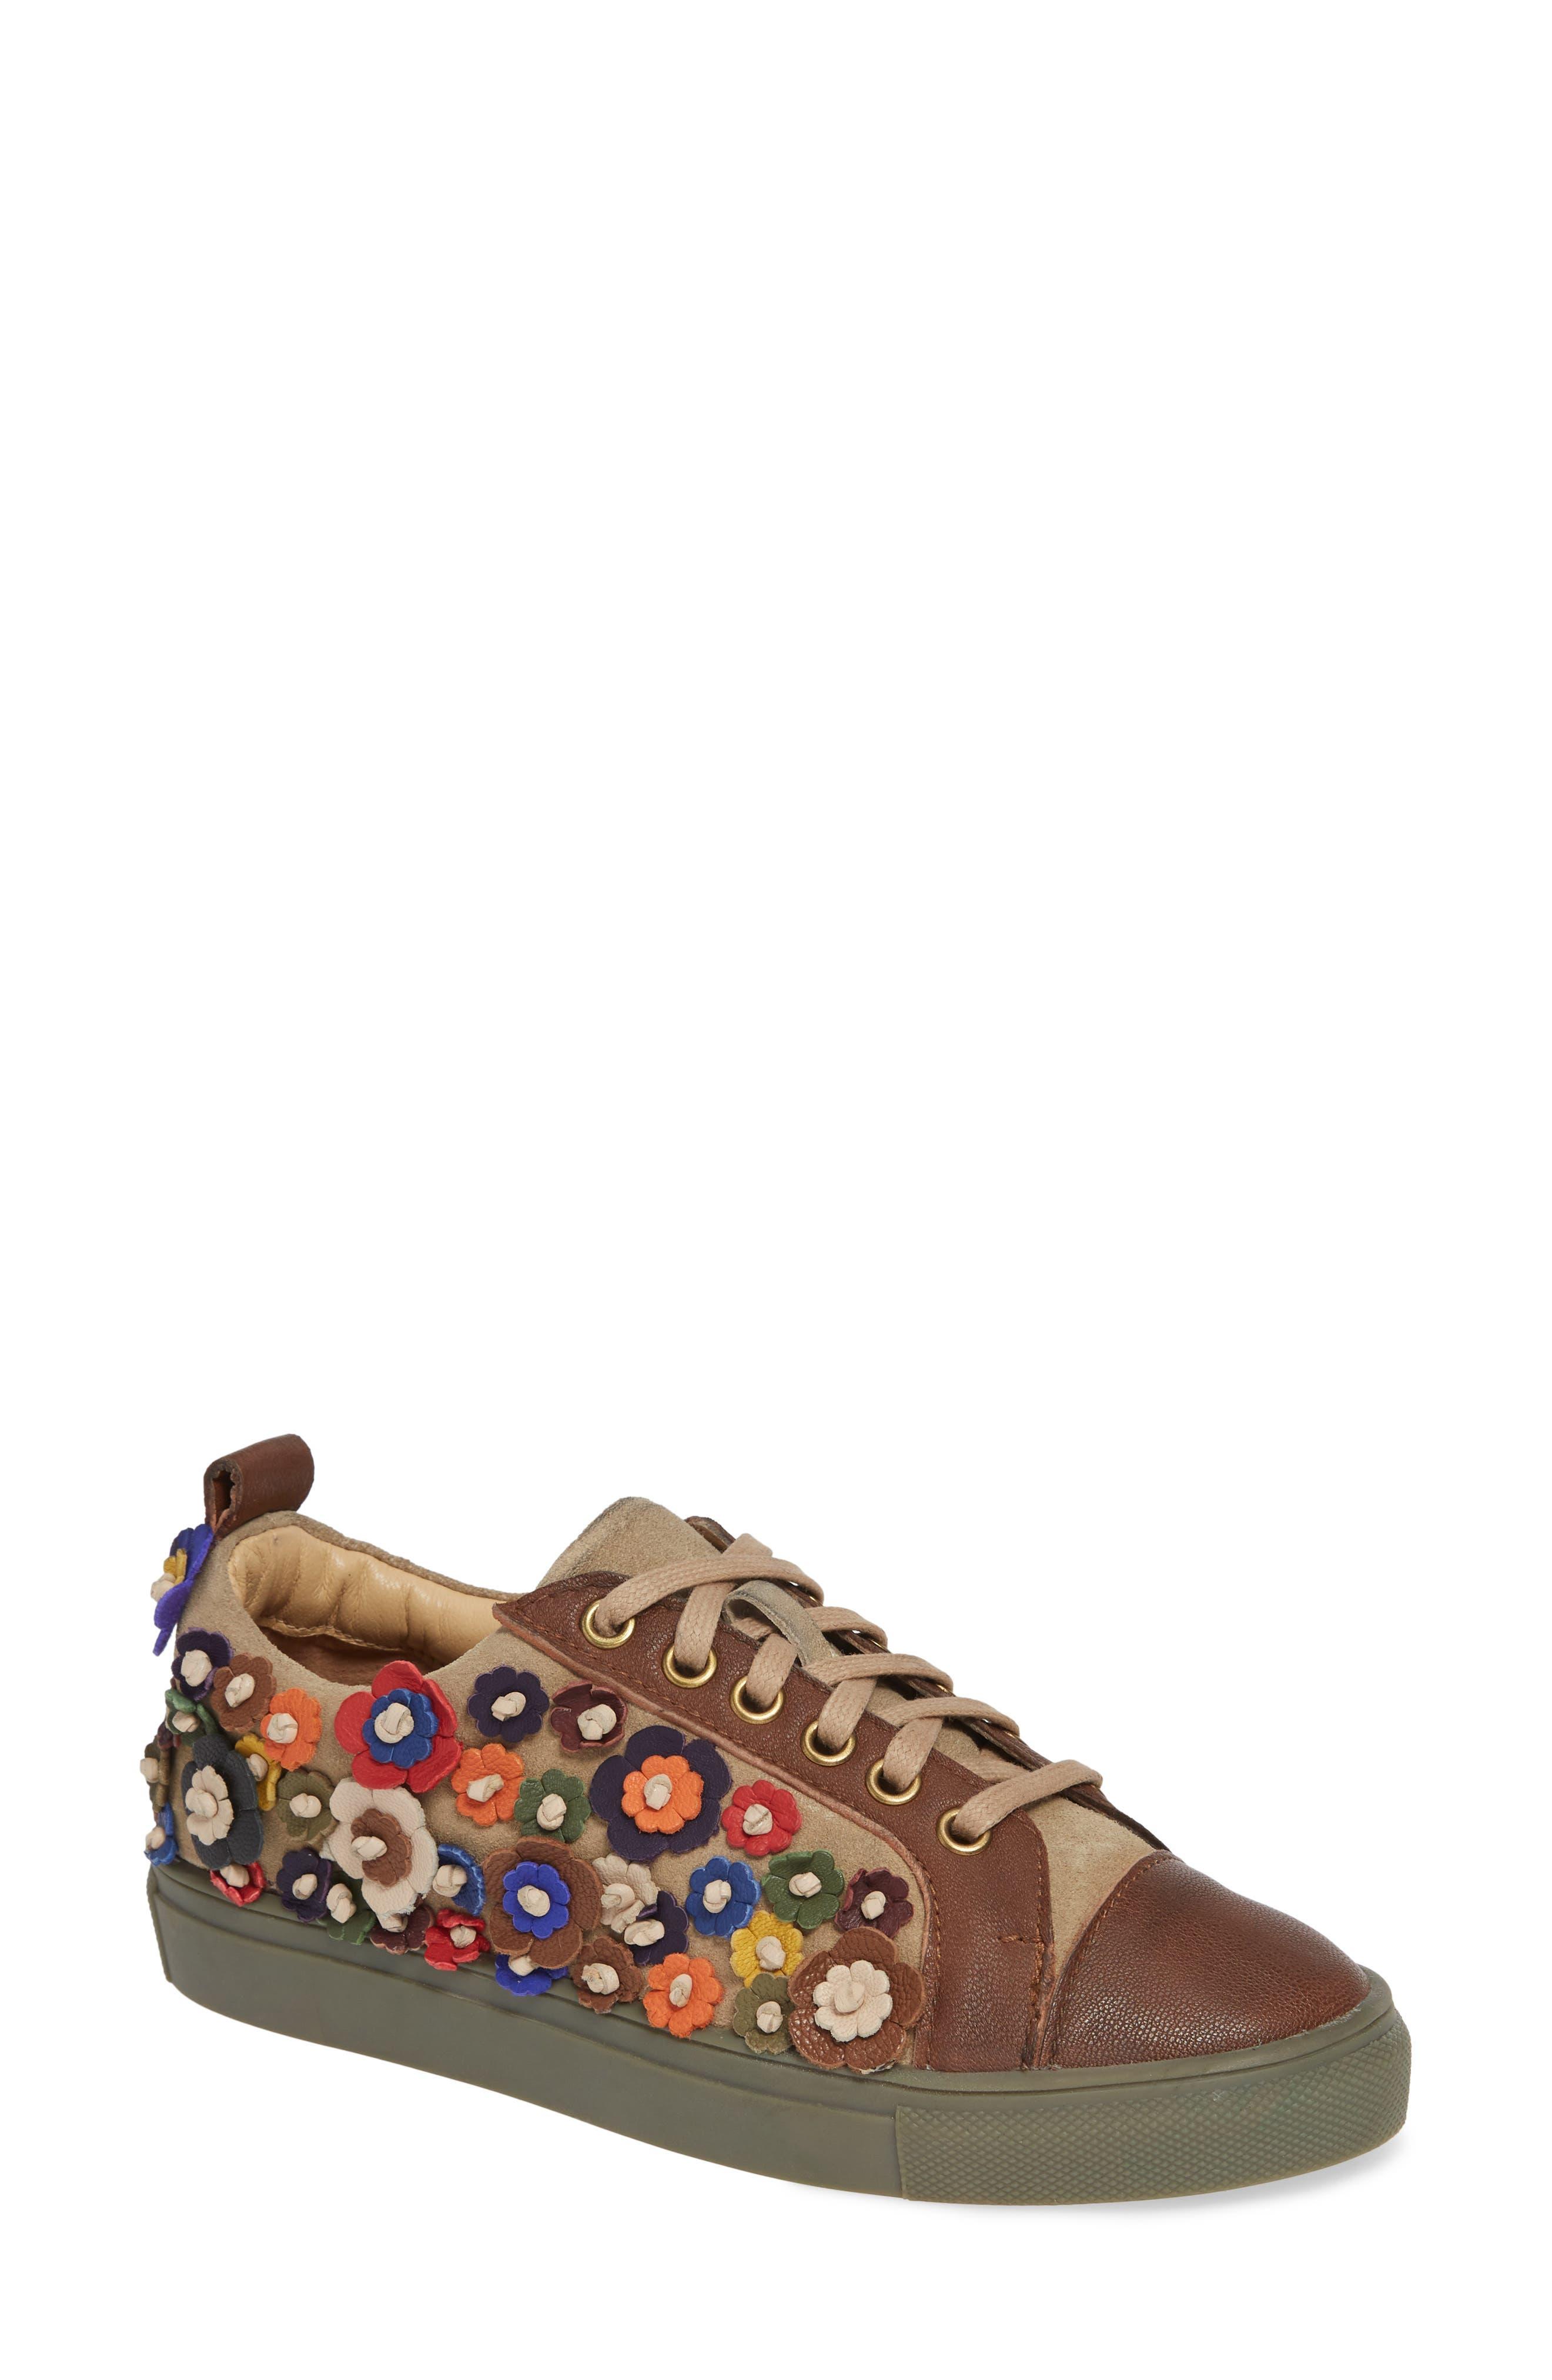 Sheridan Mia Satyr Sneaker - Brown